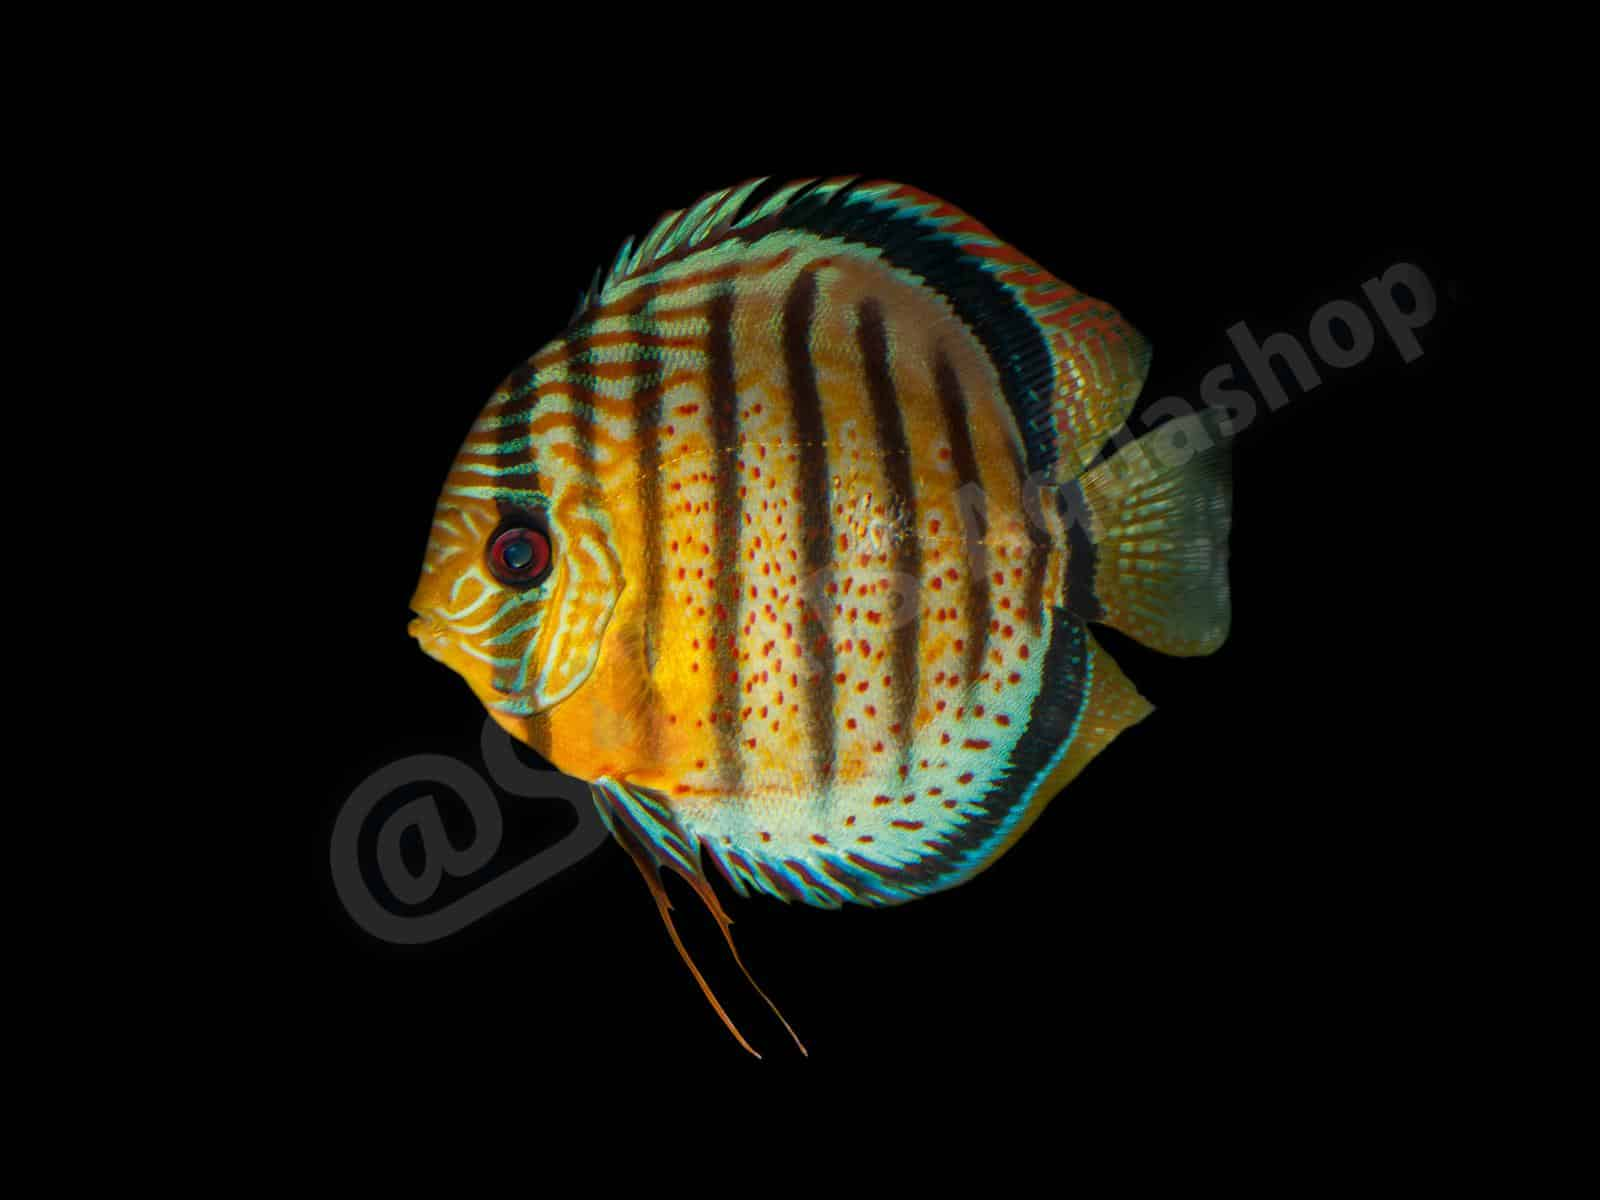 symphysodon aequifasciatus andreas tanke 0001 7